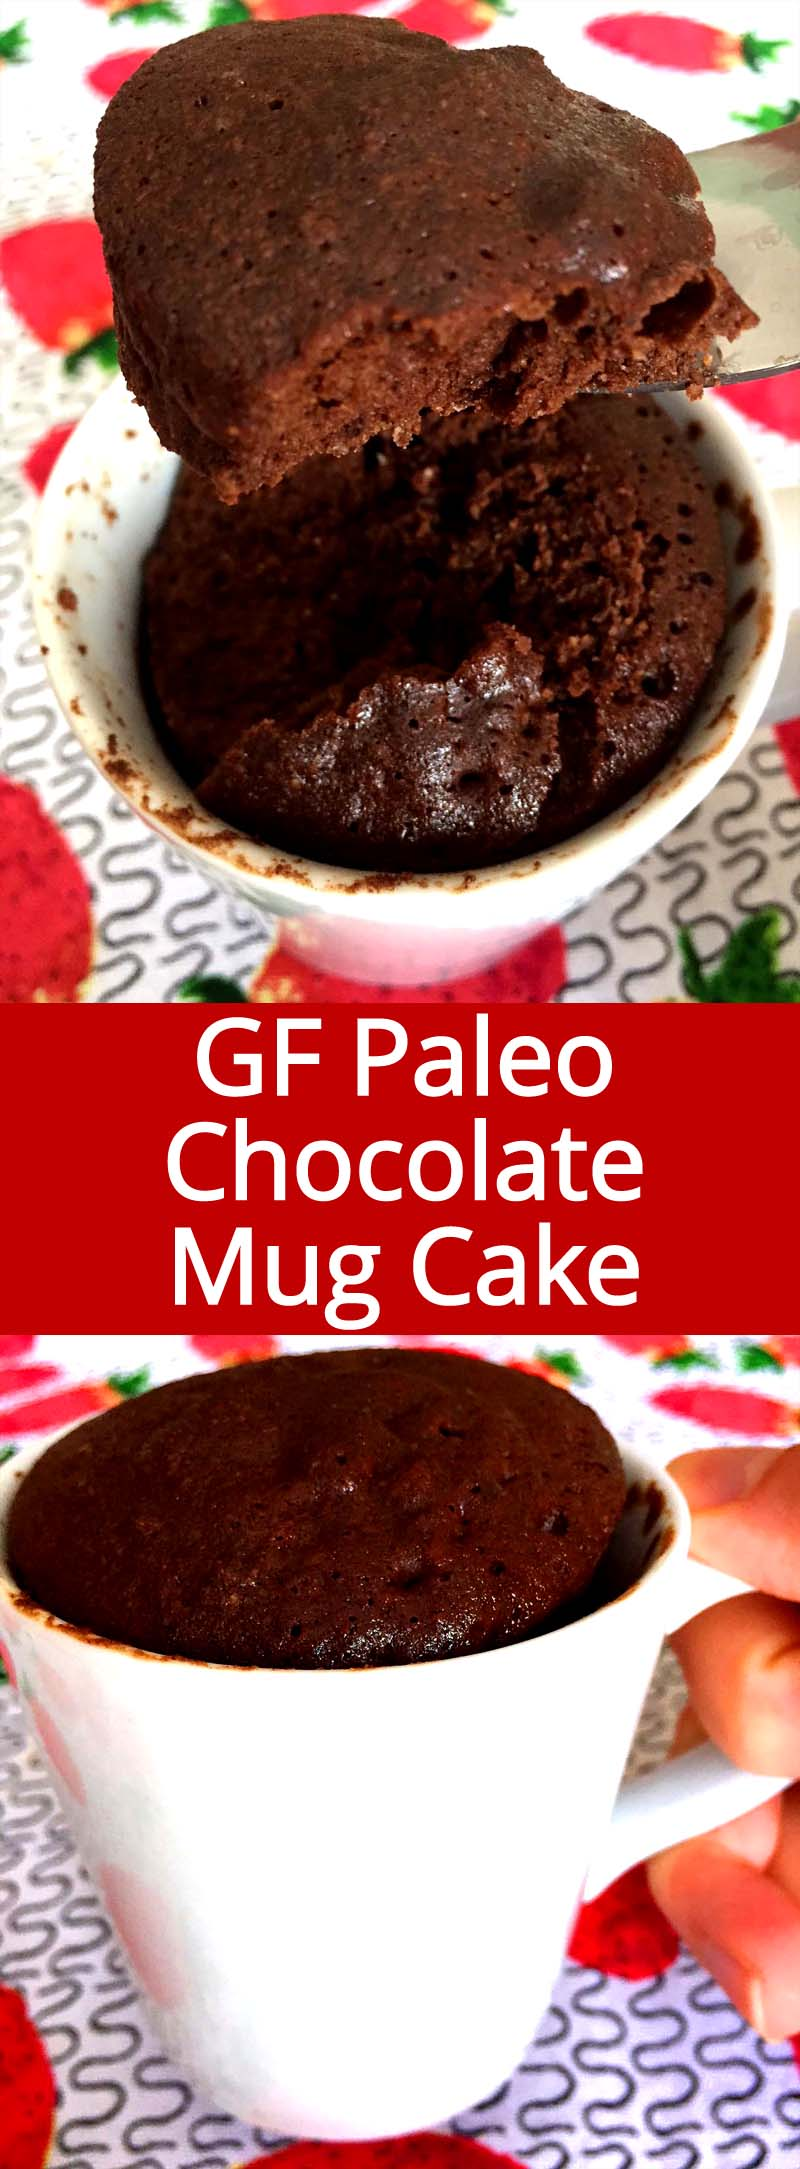 Mug Recipes Dessert Peanut Butter